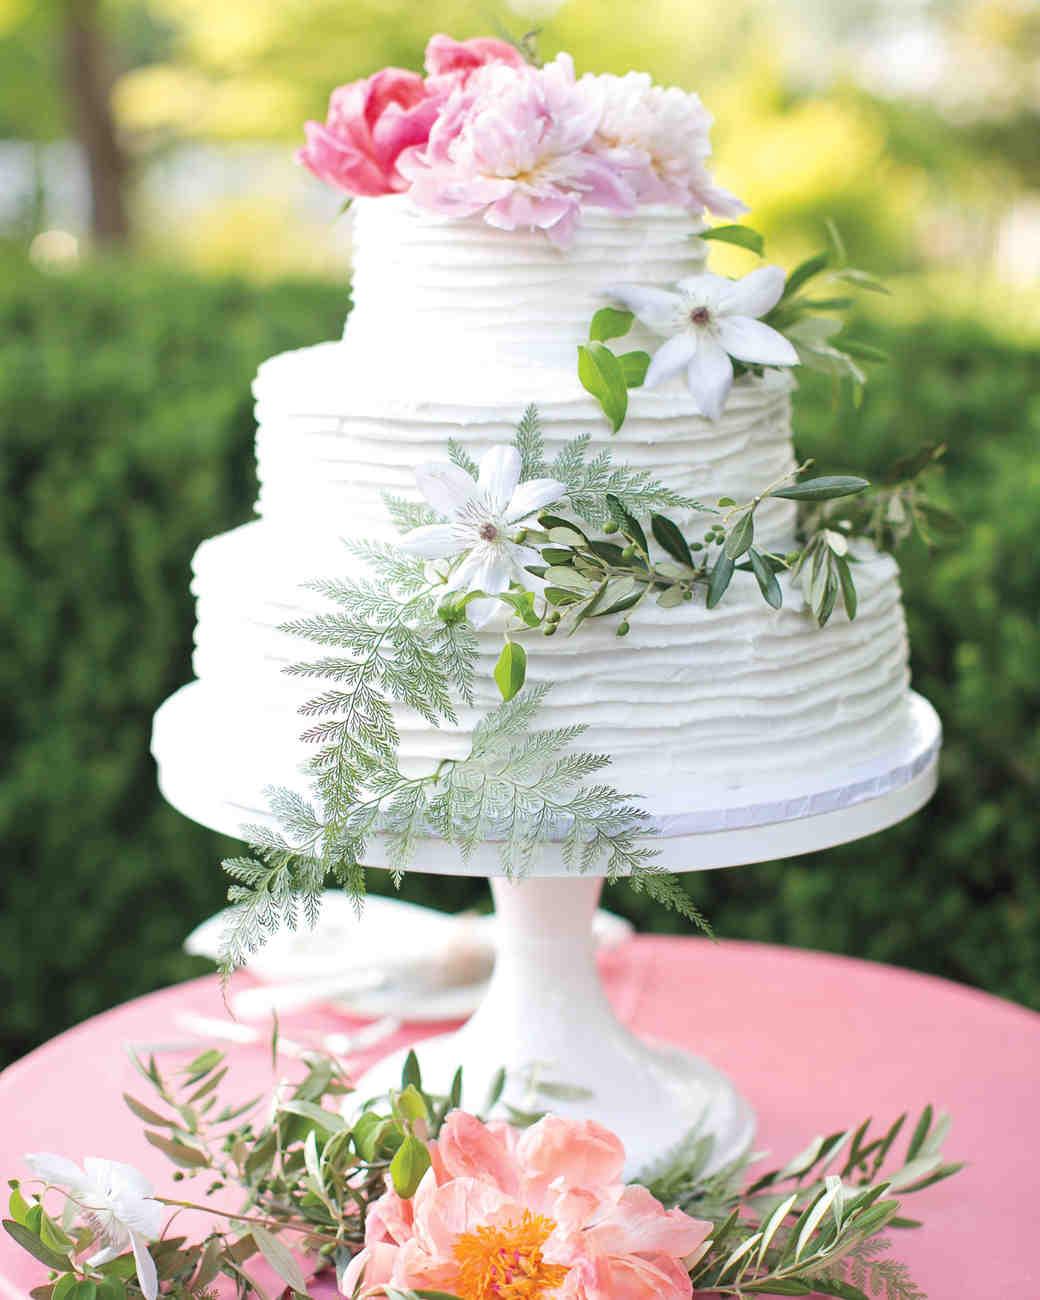 courtney-michael-reception-cake-68-s111677.jpg